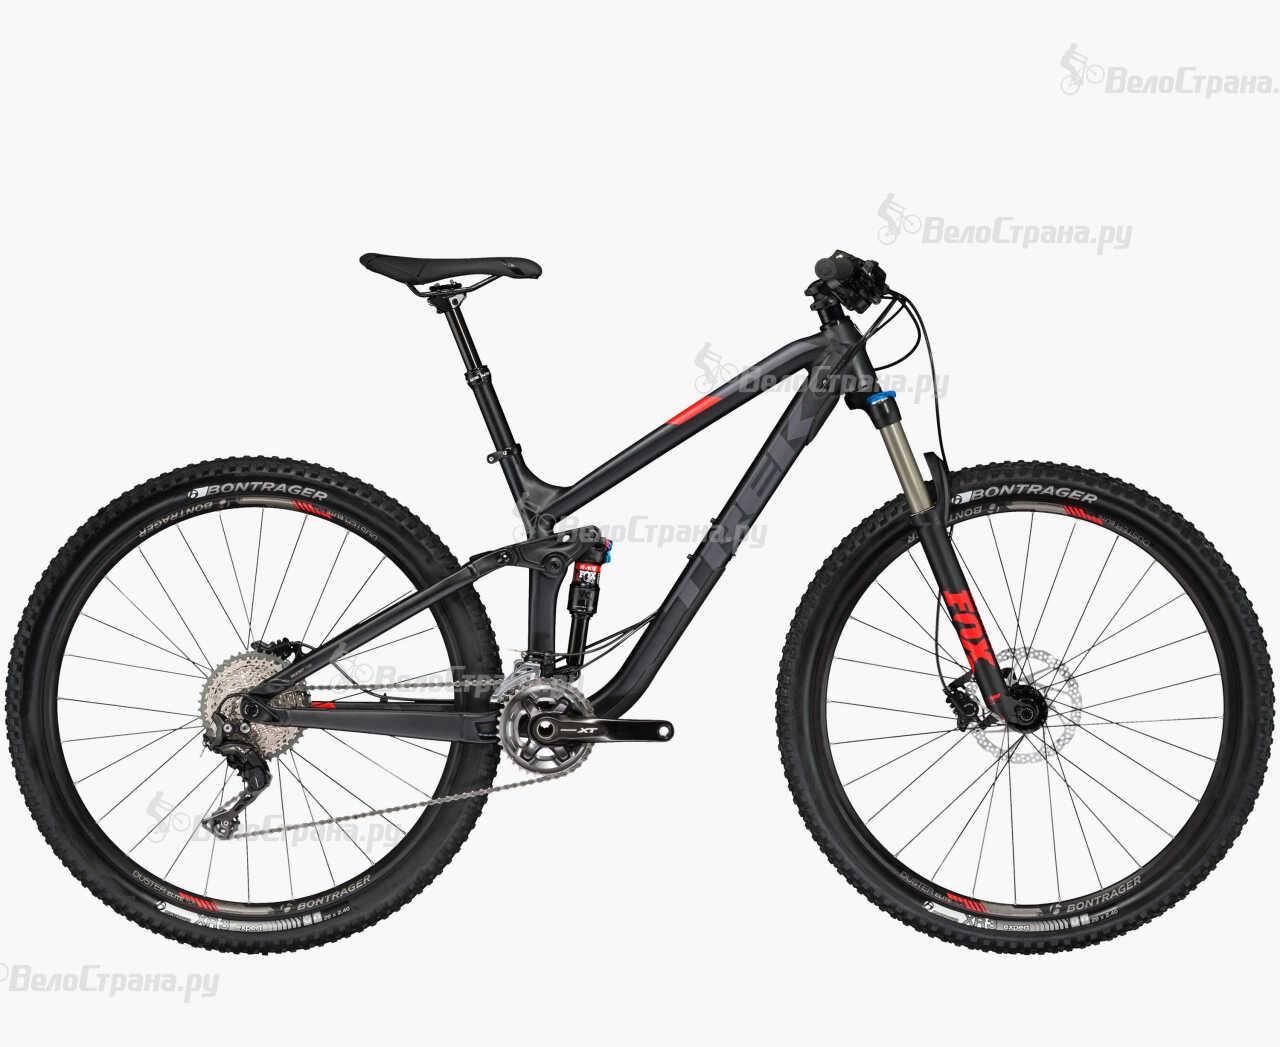 Велосипед Trek Fuel EX 8 29 (2017) велосипед trek fuel ex 9 29 2017